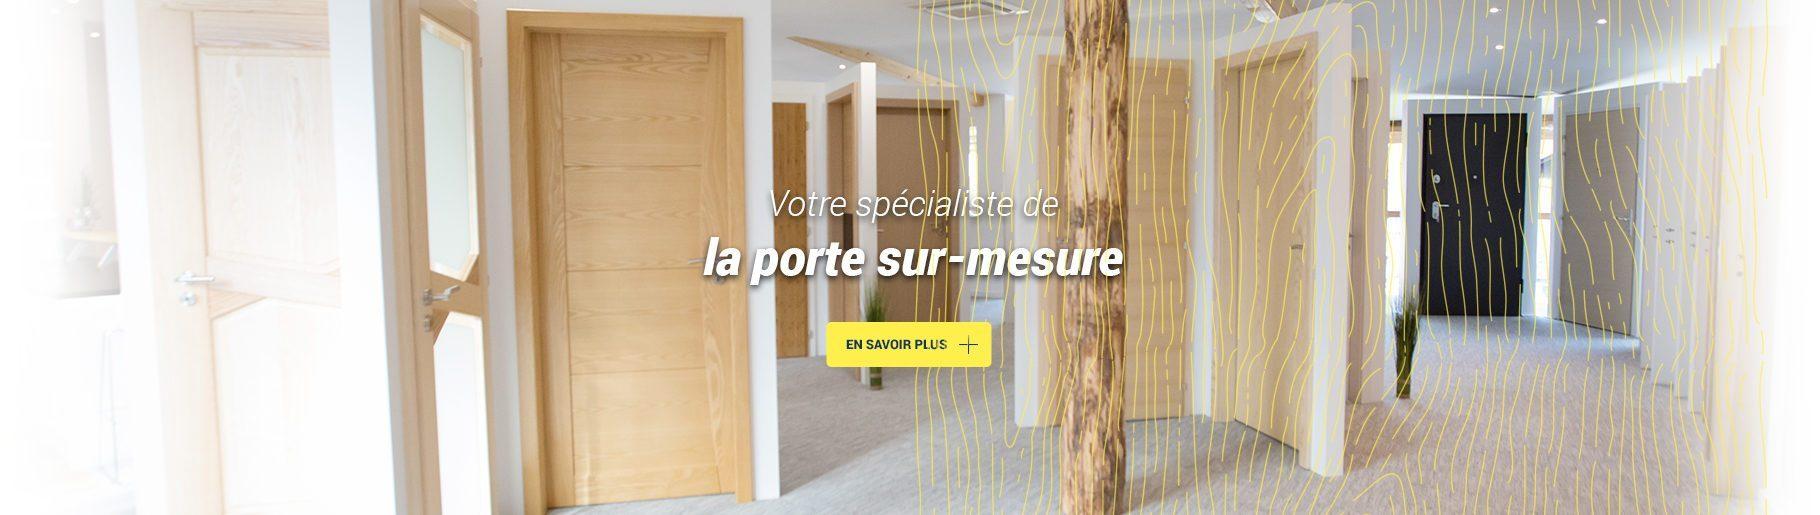 "<img width=""1820"" height=""515"" src=""http://www.menuiserie-kleim.fr/app/uploads/2017/06/porte-1820x515.jpg"" class=""attachment-full size-full wp-post-image"" alt=""Portes"" title=""Portes"" data-copyright="""" data-headline=""porte-1820x515"" data-description="""" />"